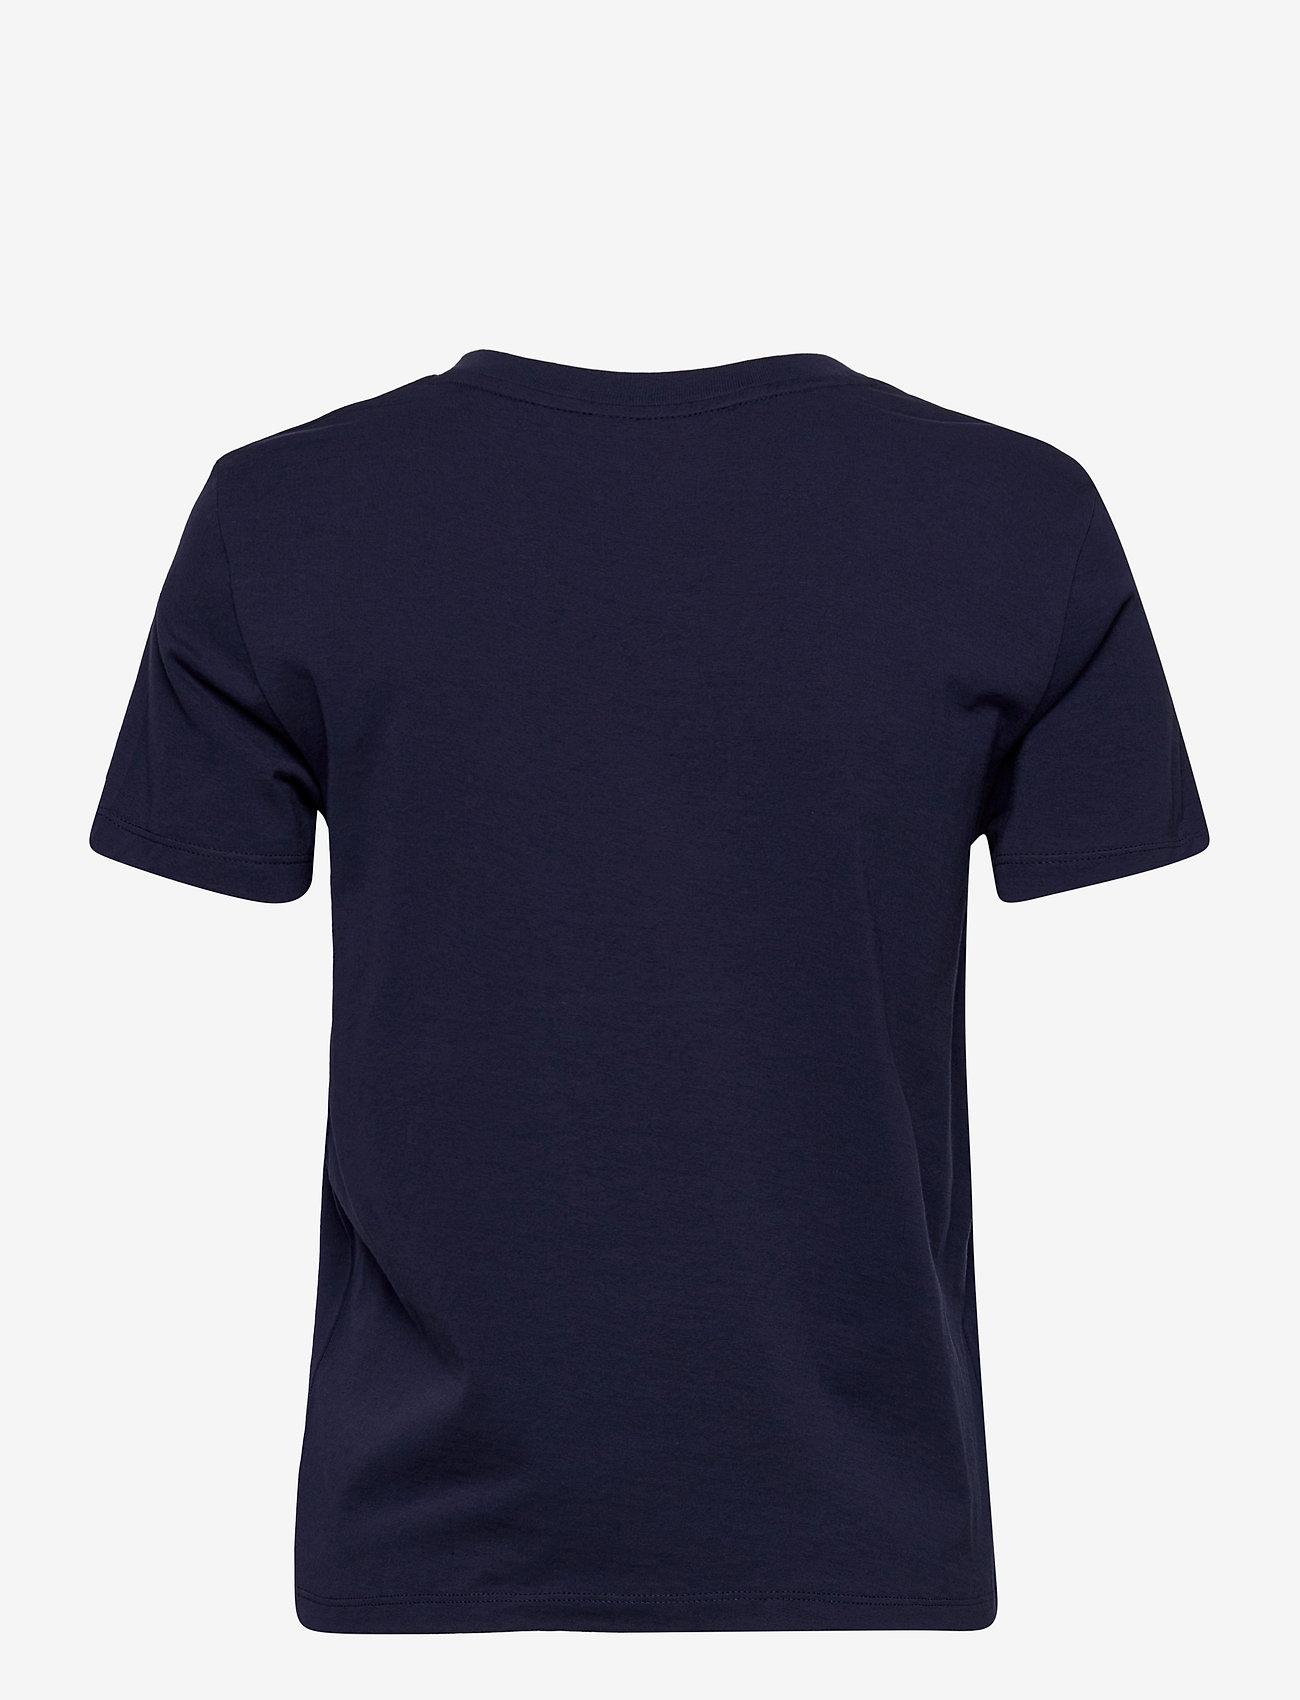 GANT - ARCHIVE SHIELD SS T-SHIRT - t-shirts - evening blue - 1